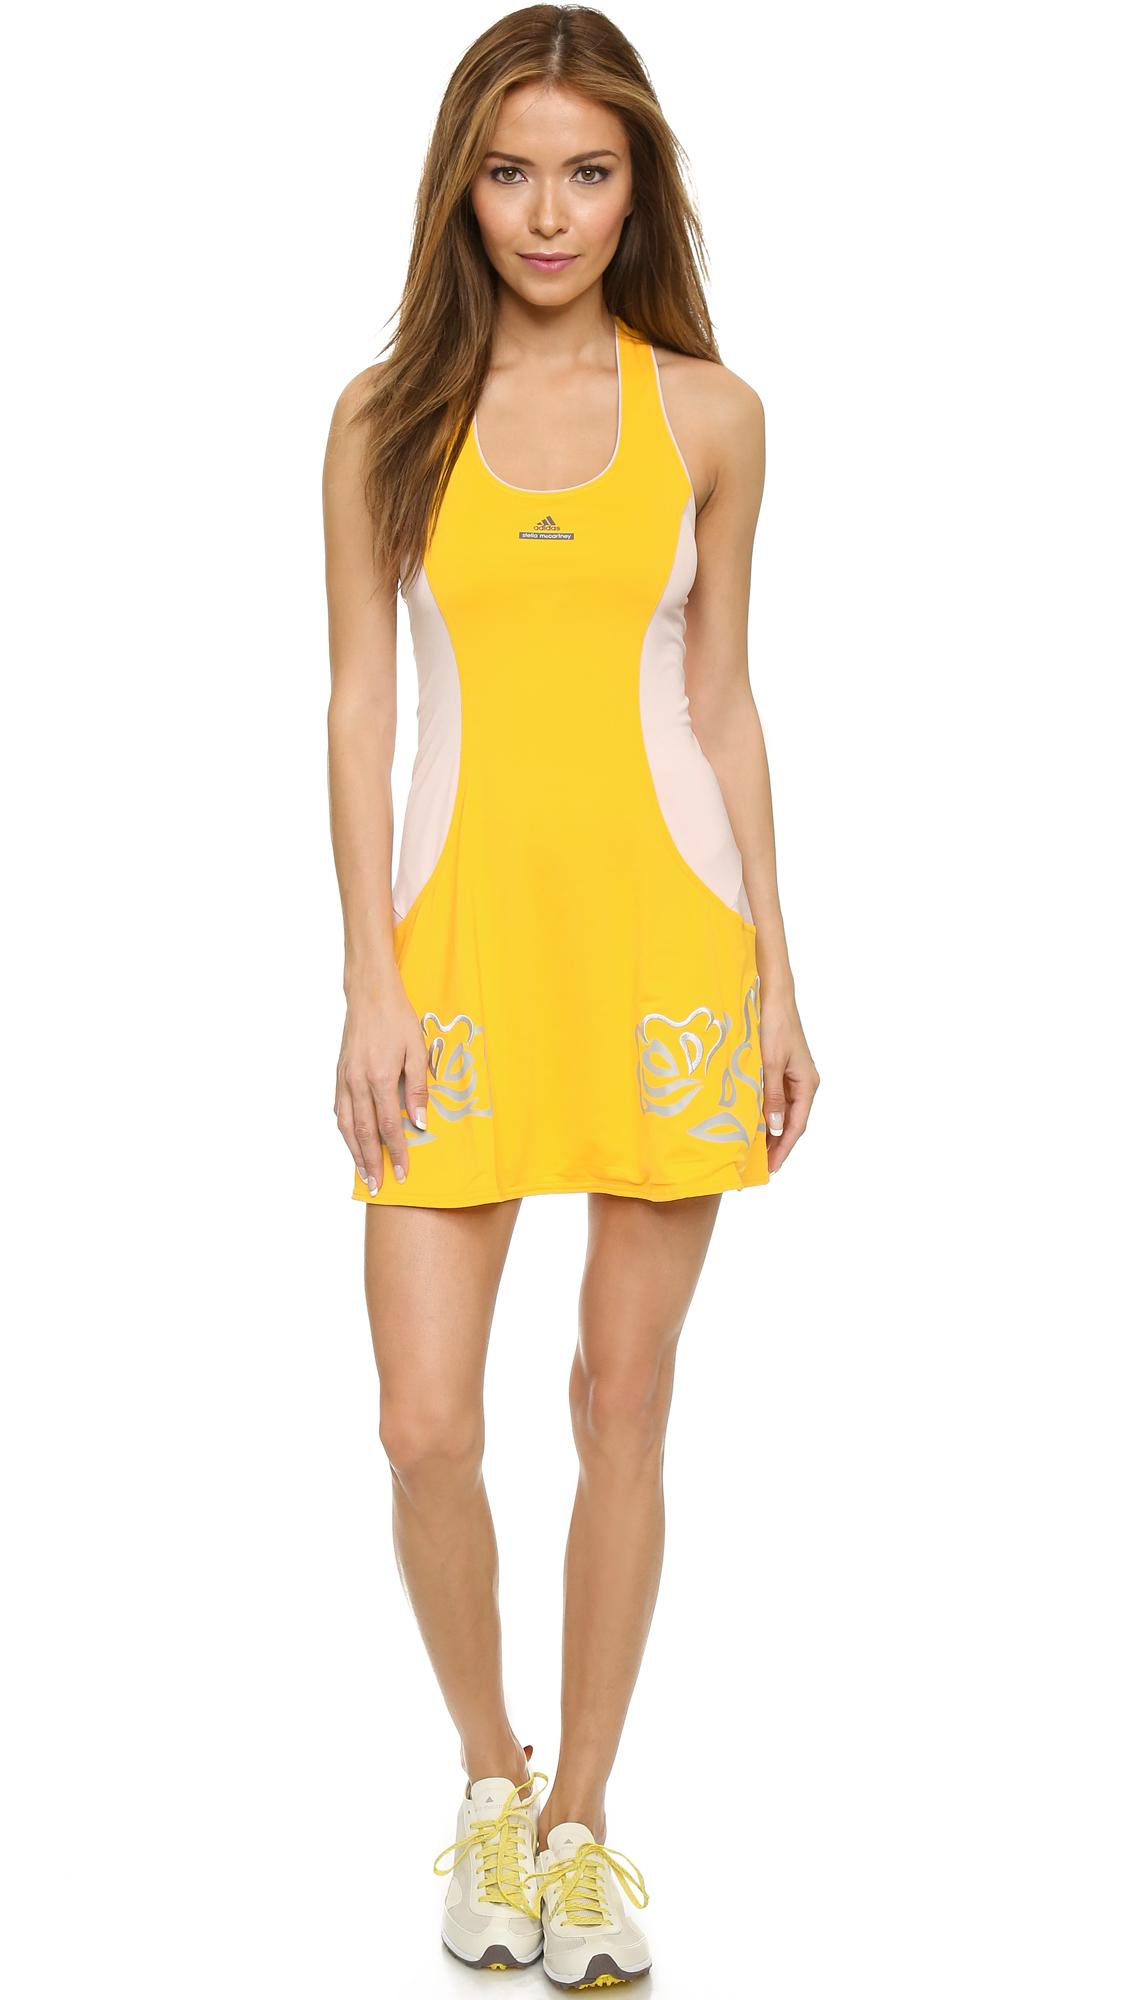 05d7548862d Stella Mccartney Adidas Tennis Dress   Weddings Dresses